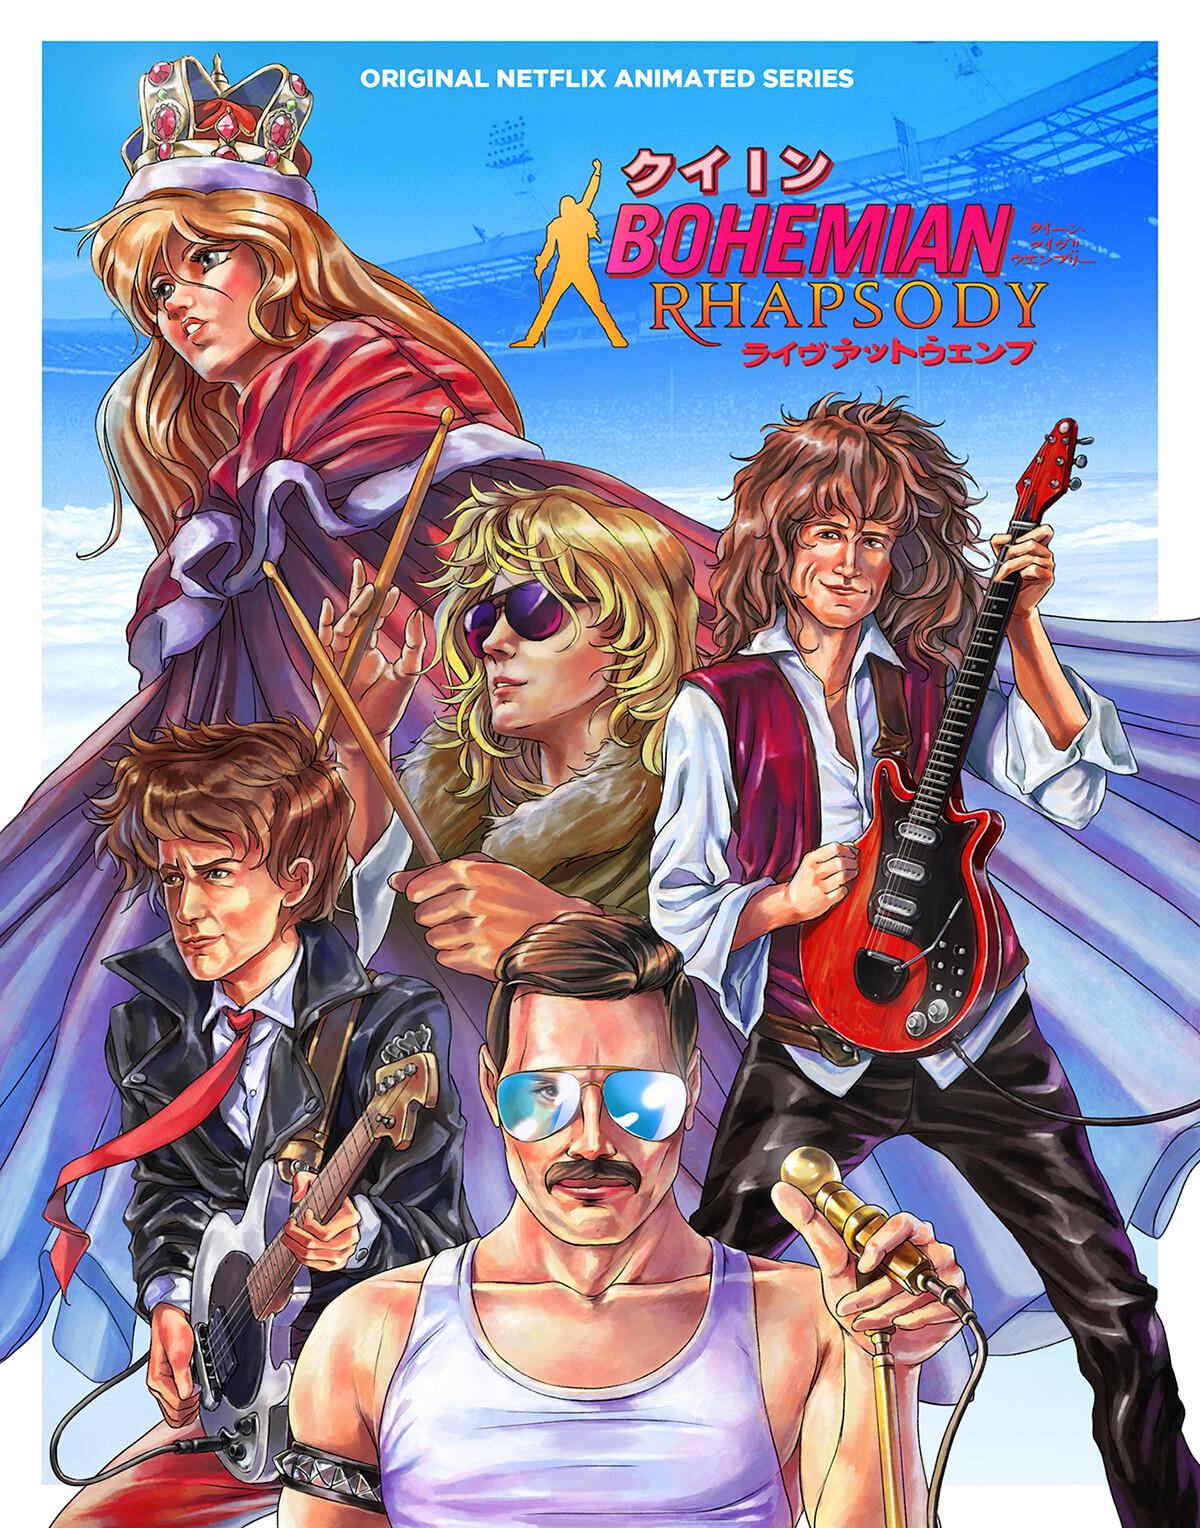 ArtStation - Bohemian Rhapsody, F  Dranka